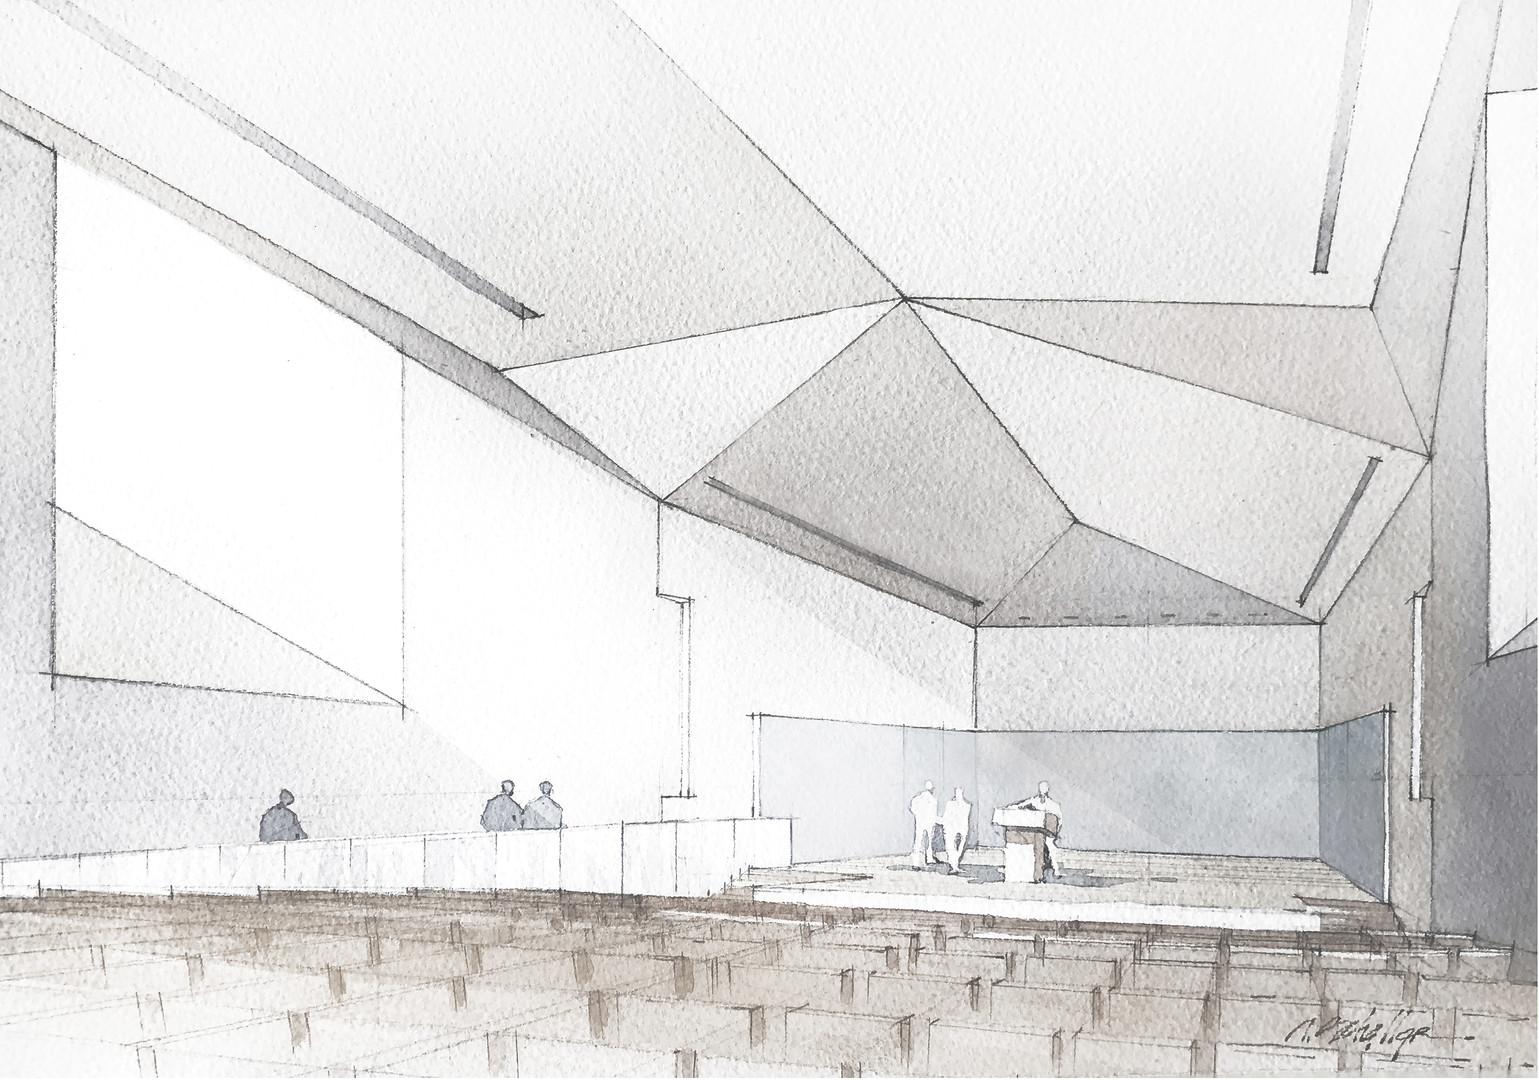 About the Auditorium